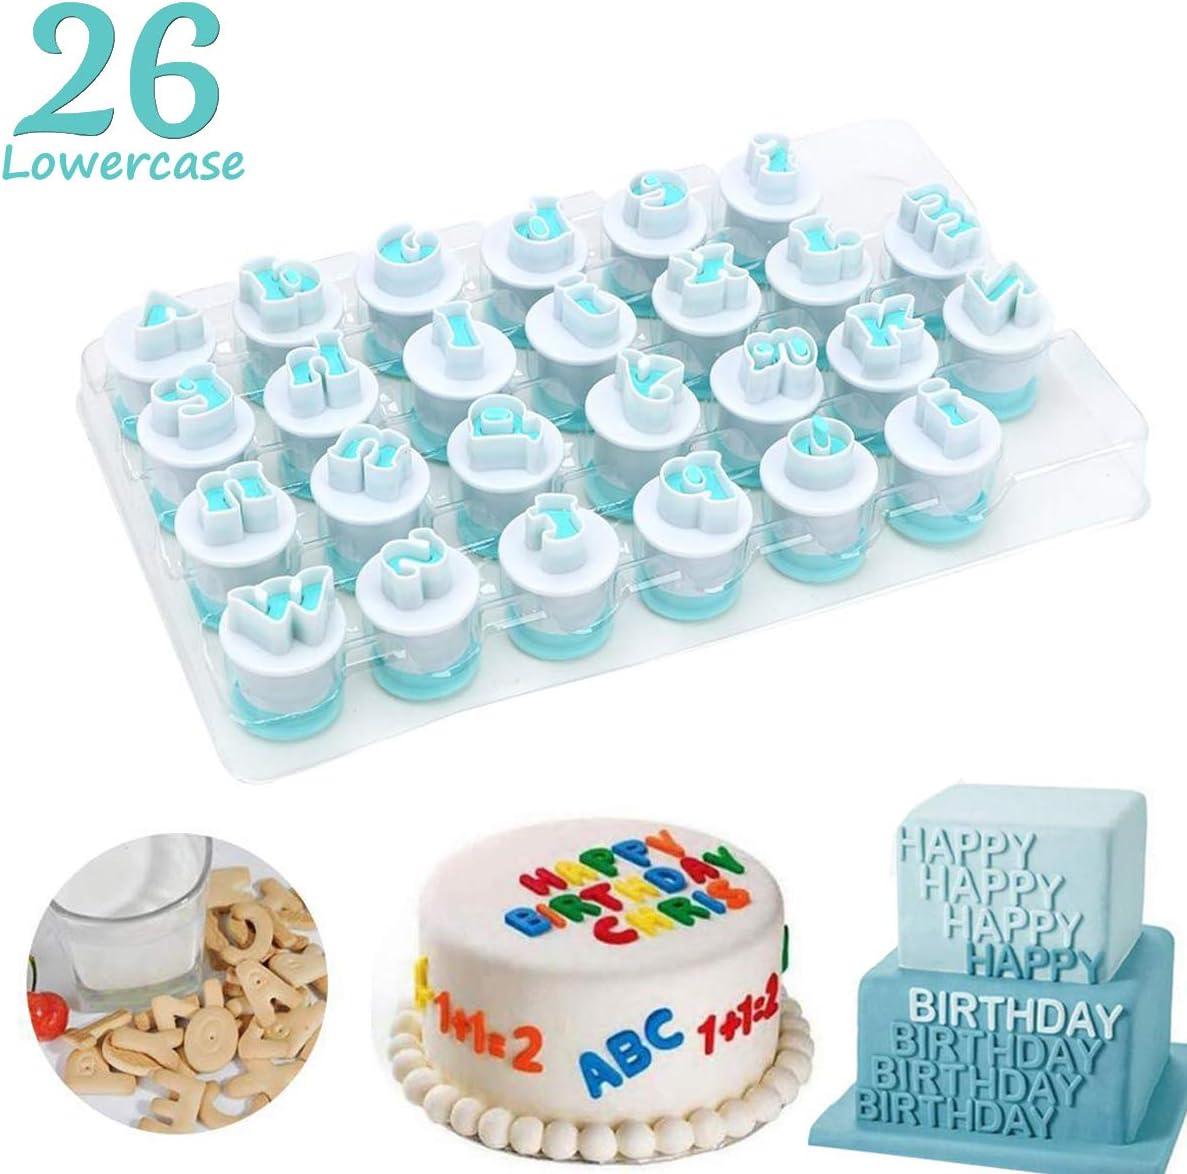 26pcs//set Lowercase Alphabet Letter Cookie Cutters Cake Decorating Molds